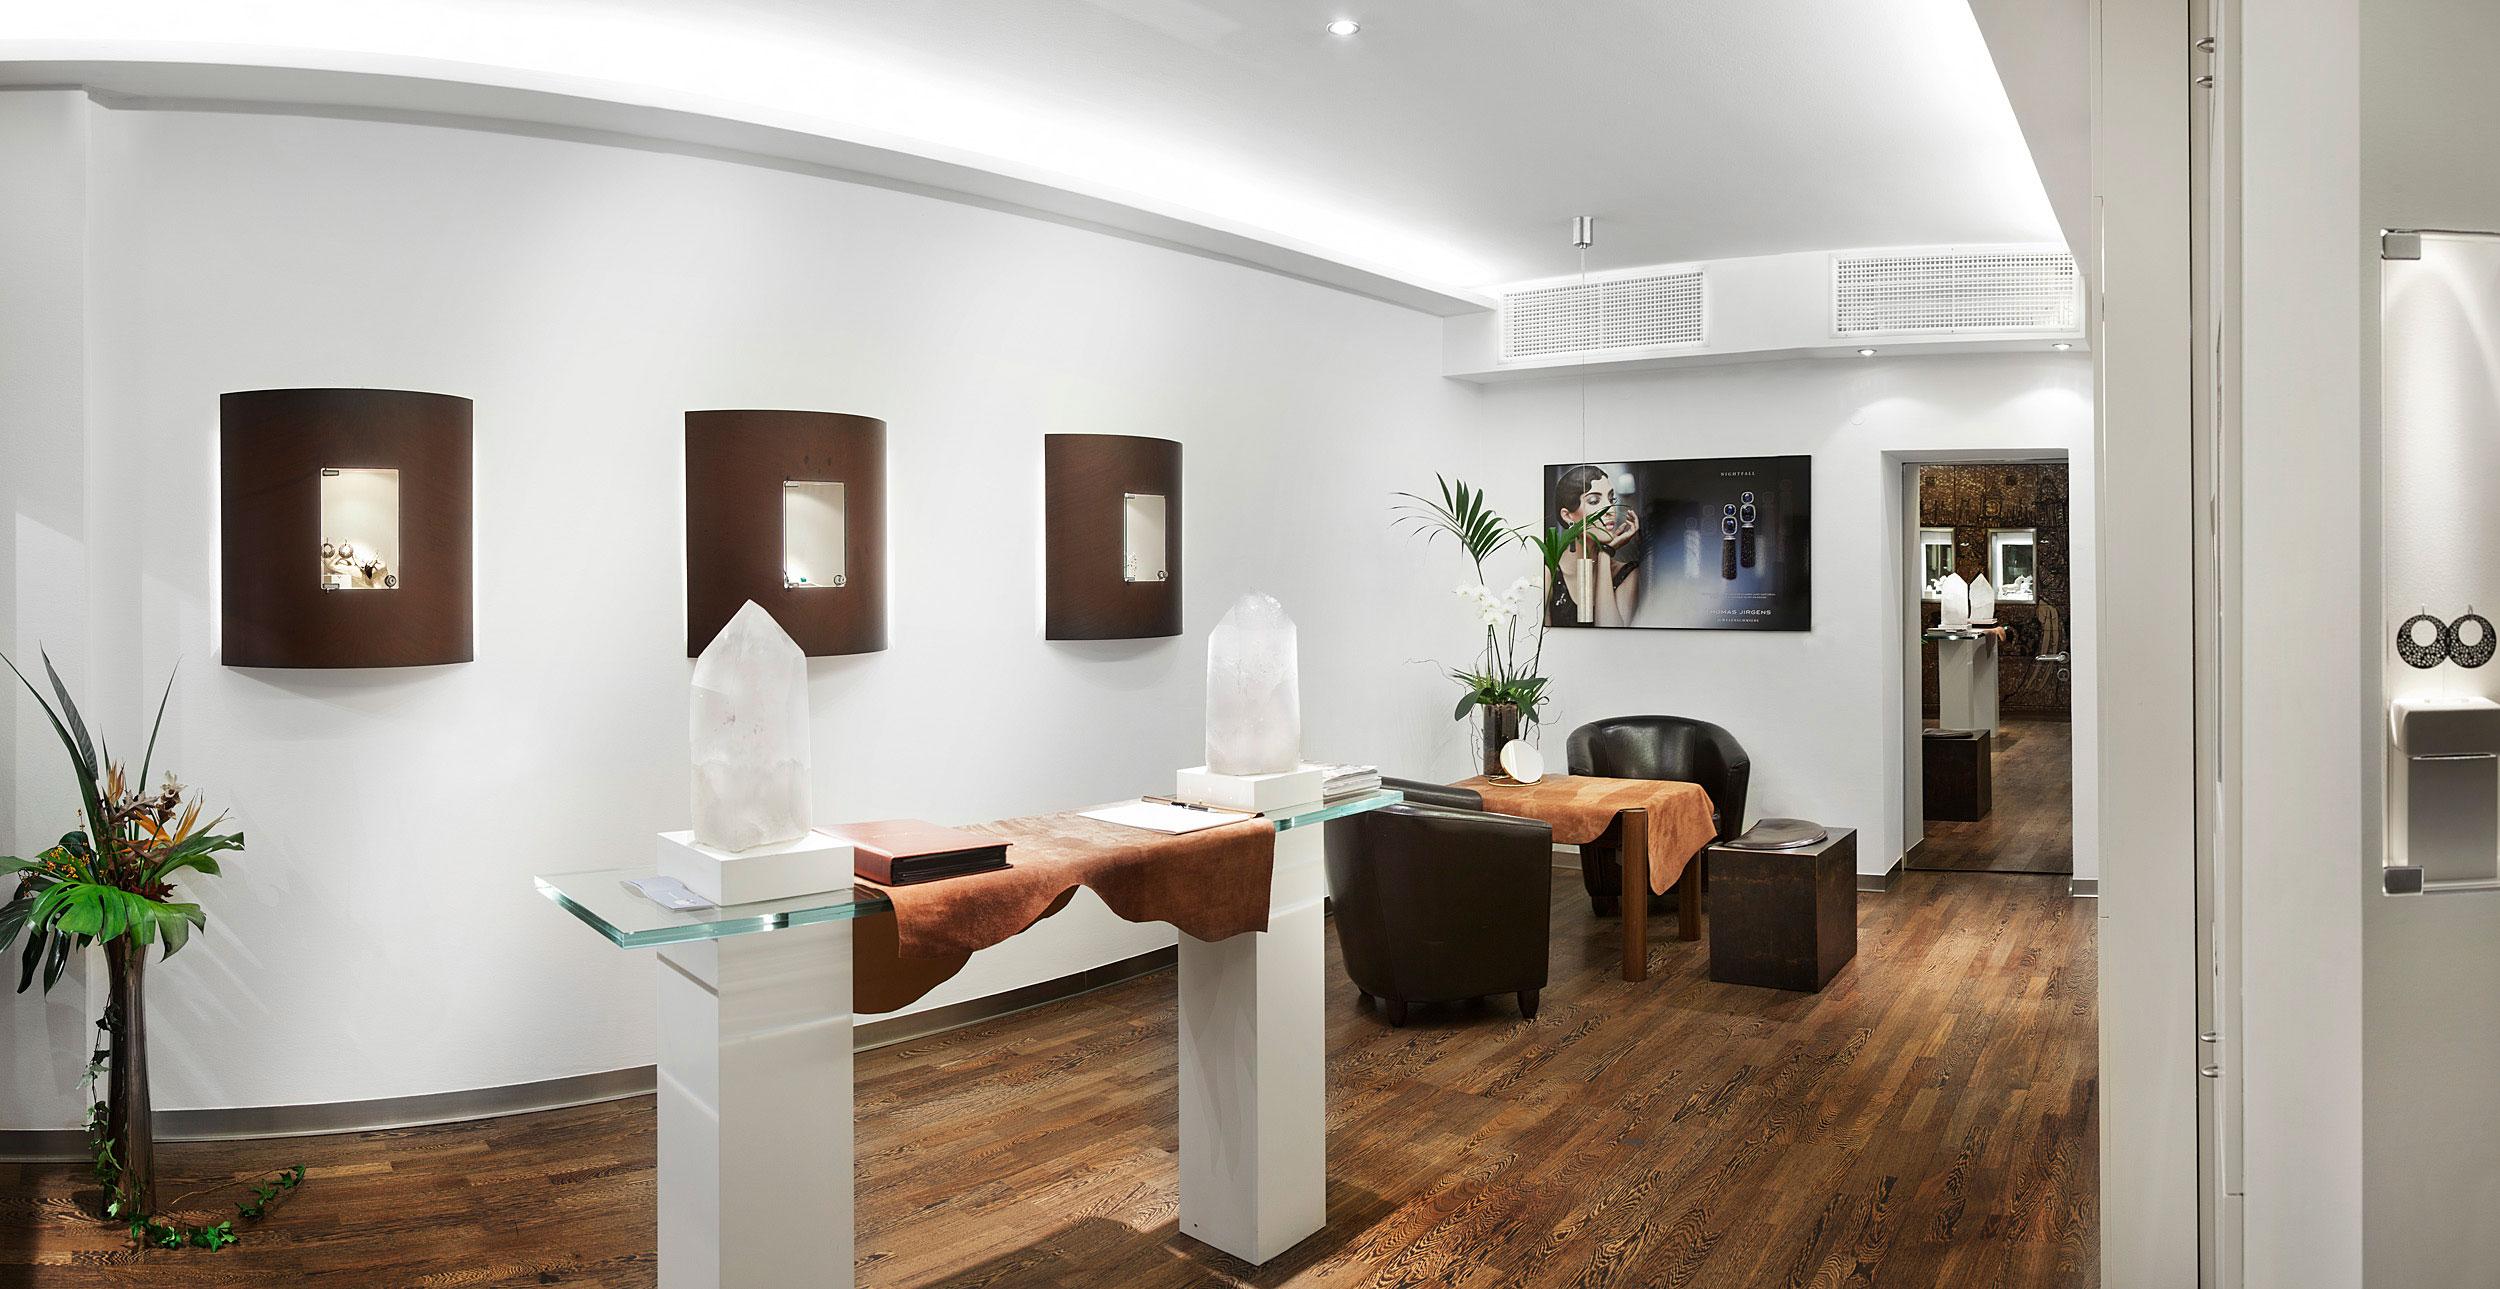 unternehmen thomas jirgens juwelenschmiede m nchen. Black Bedroom Furniture Sets. Home Design Ideas